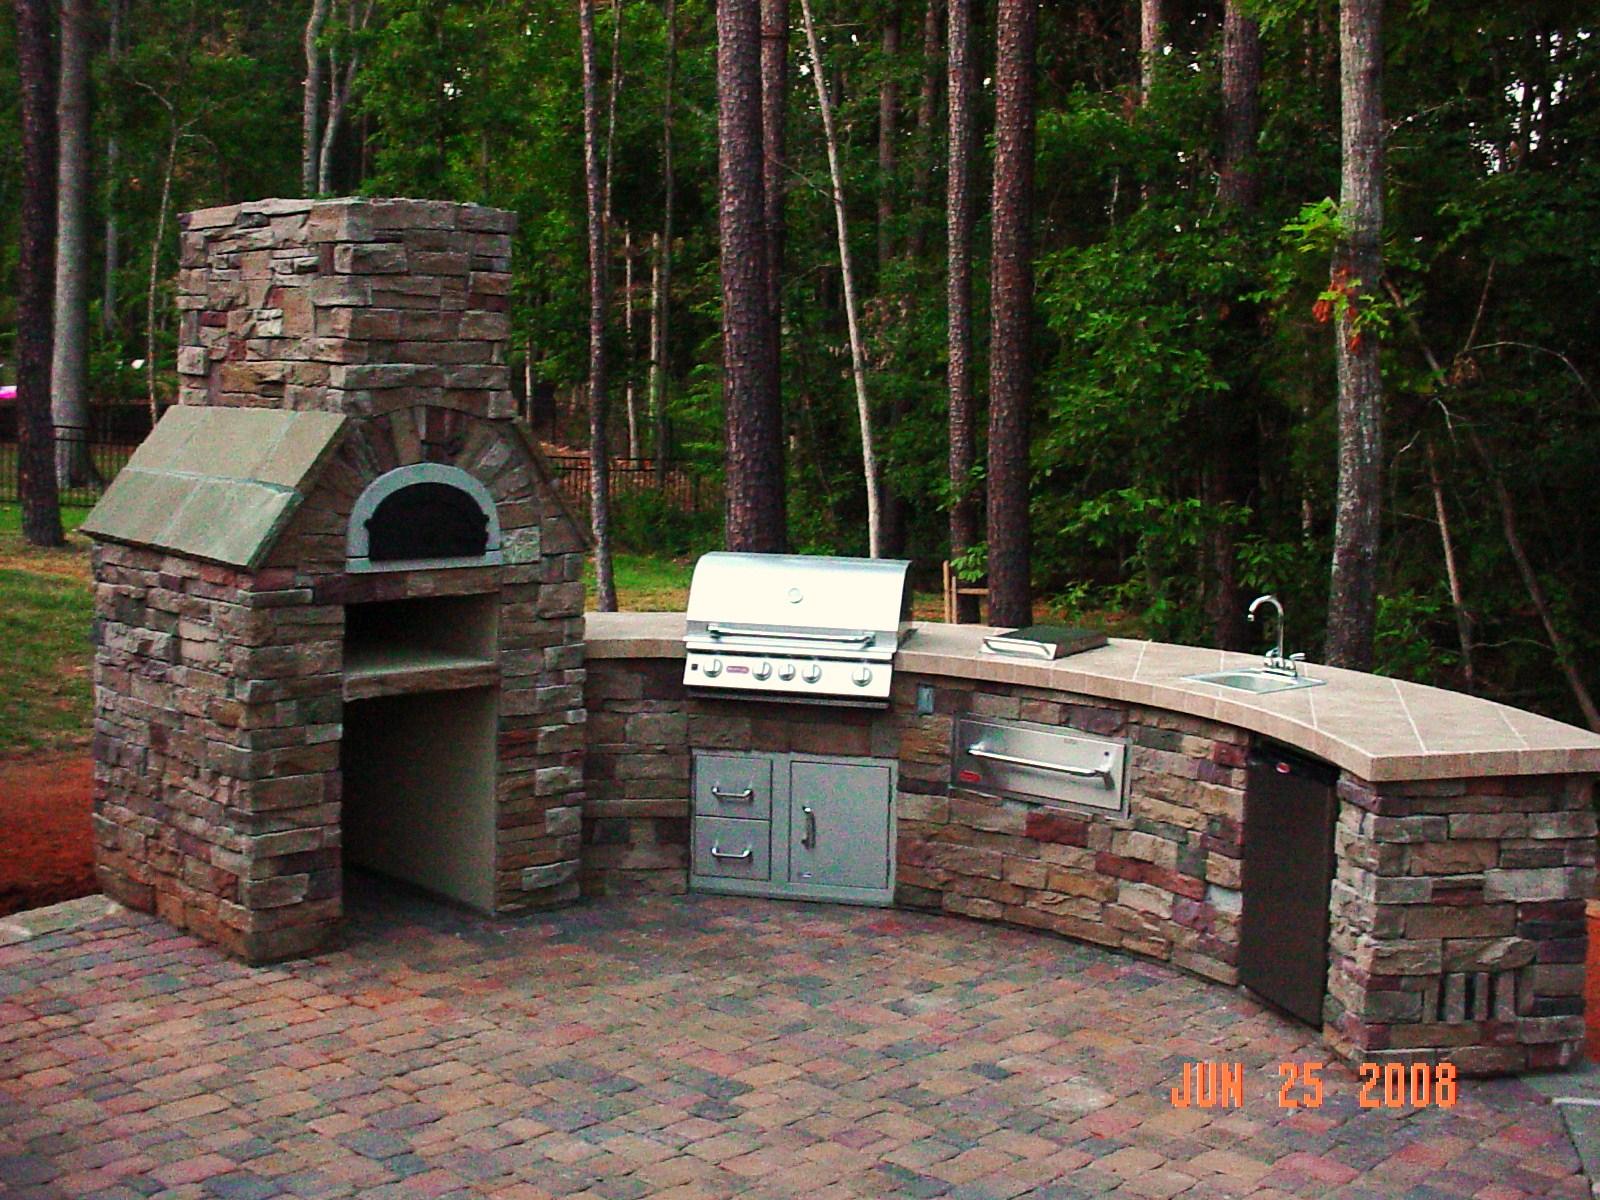 Outdoor Kitchen Oven Narrow Cabinet Funoutdoorliving Kitchens